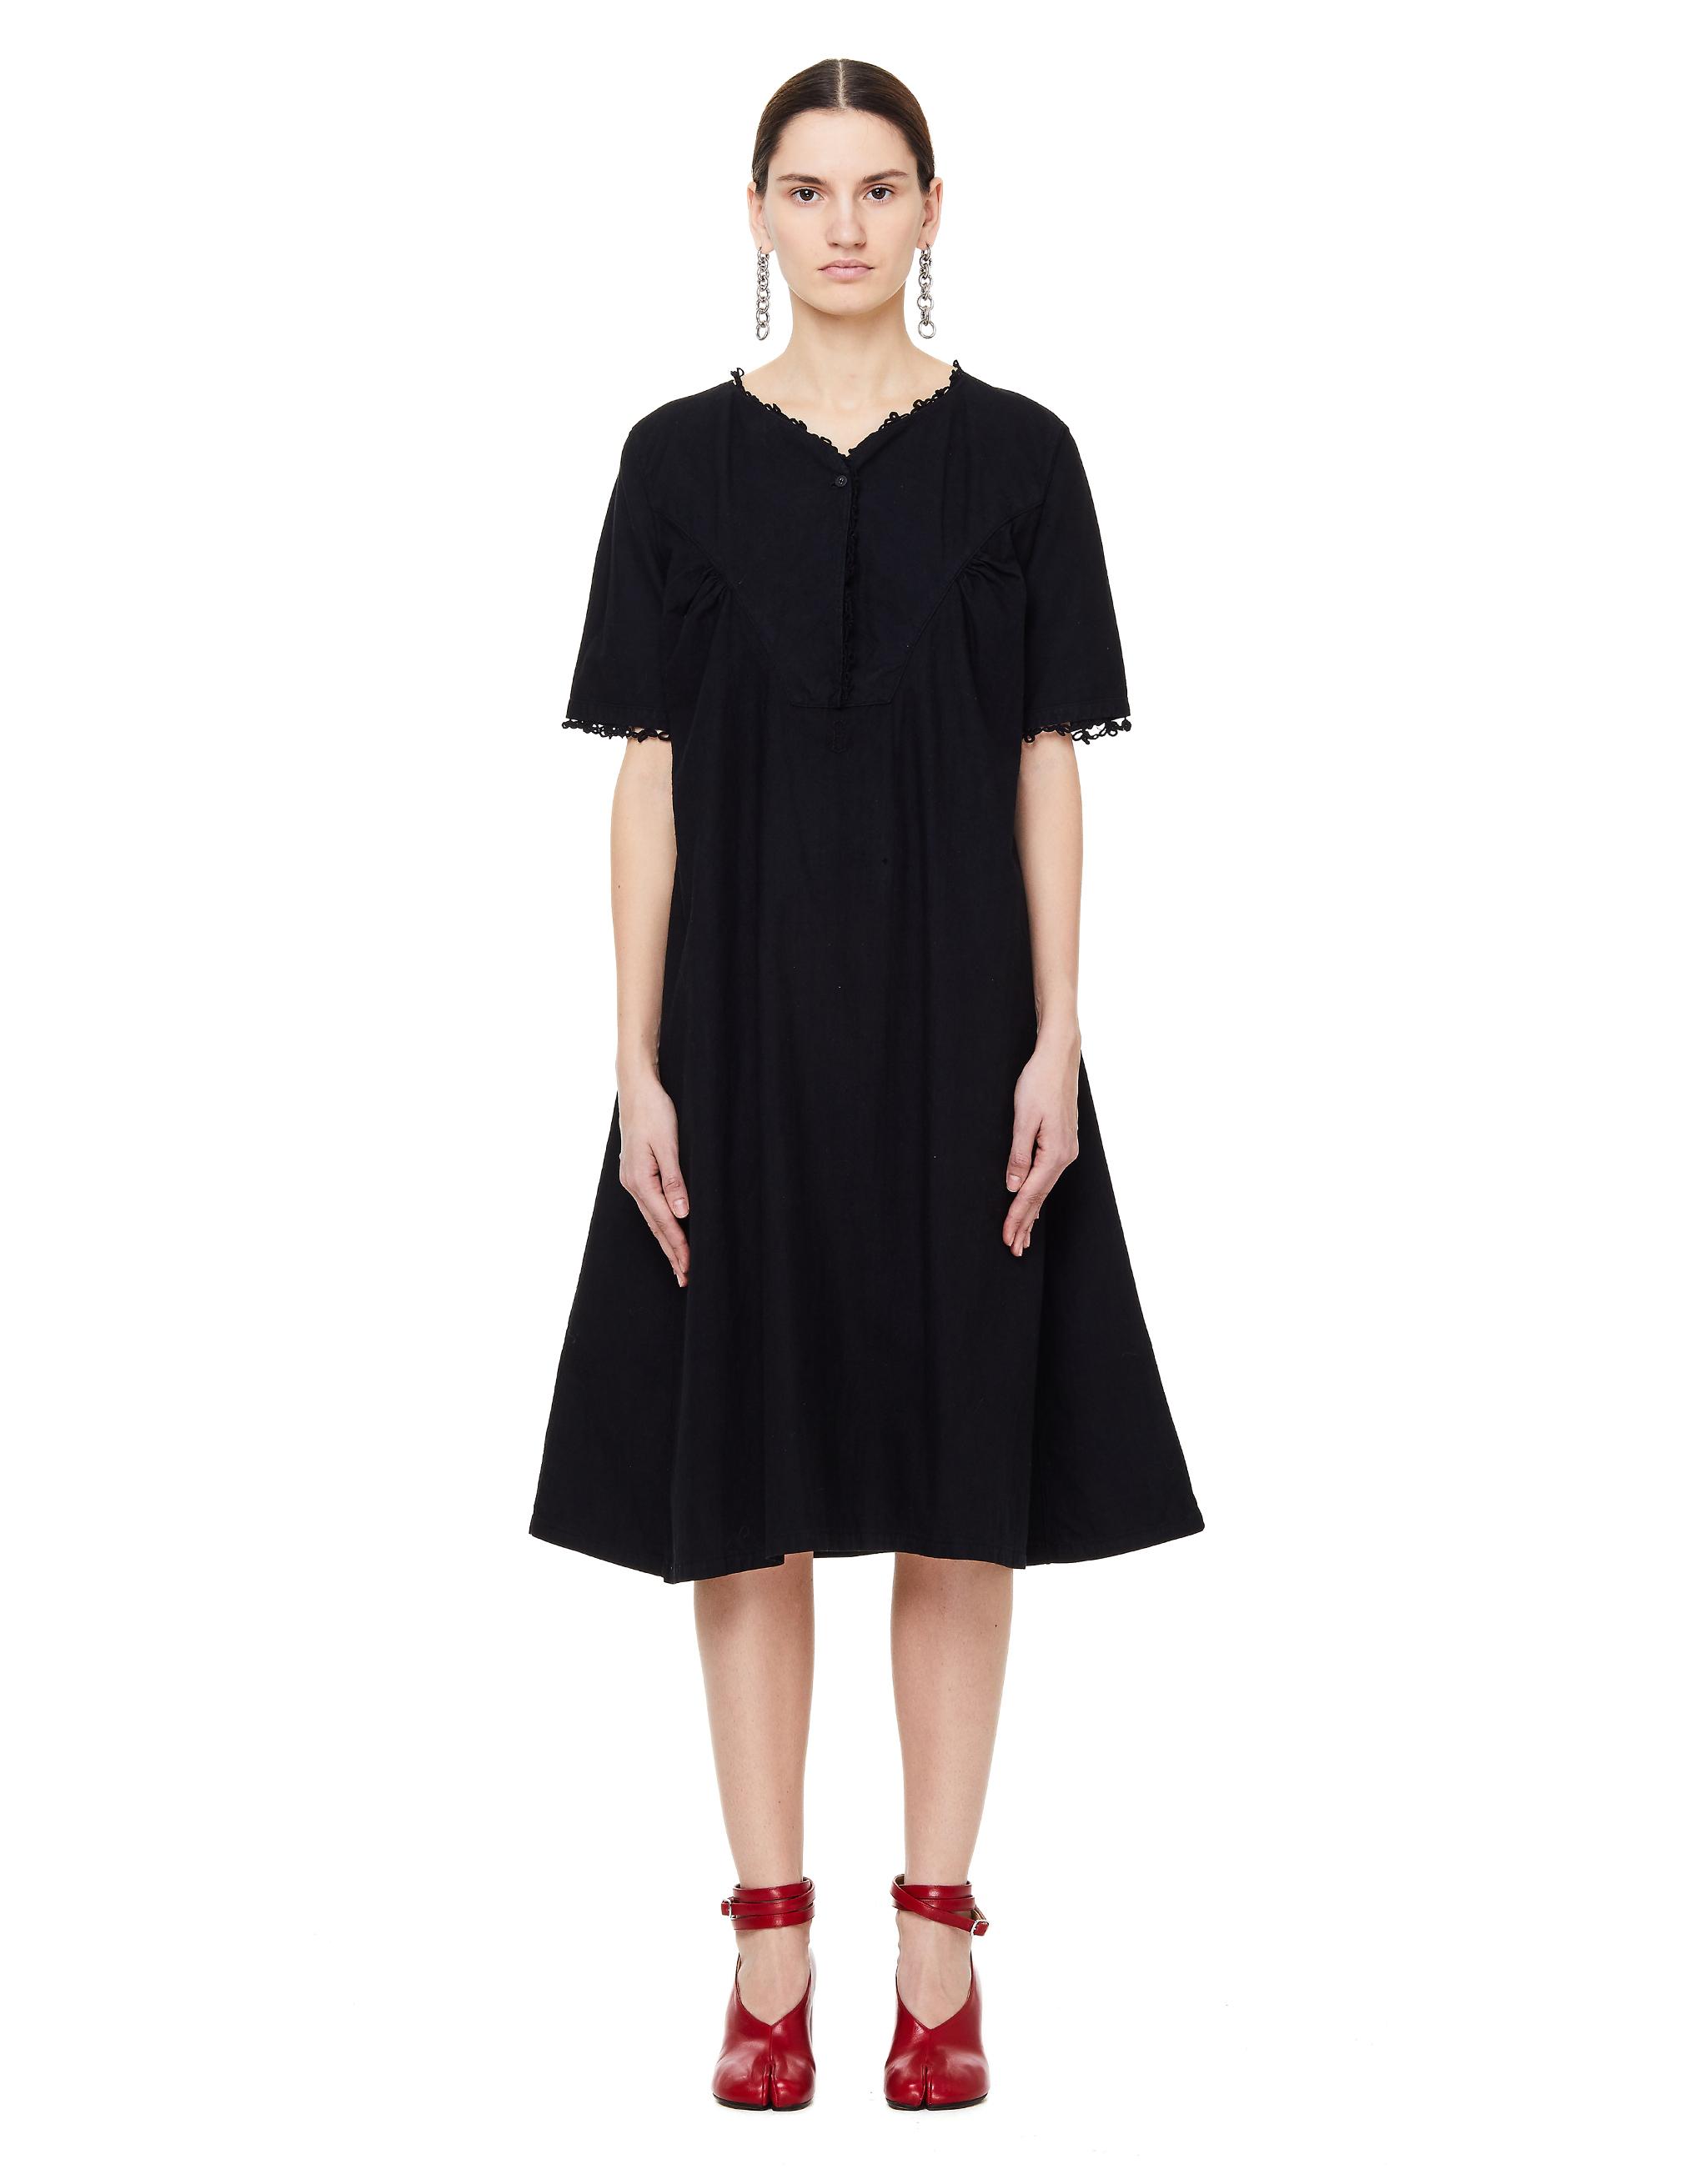 Blackyoto Black Flare Dress